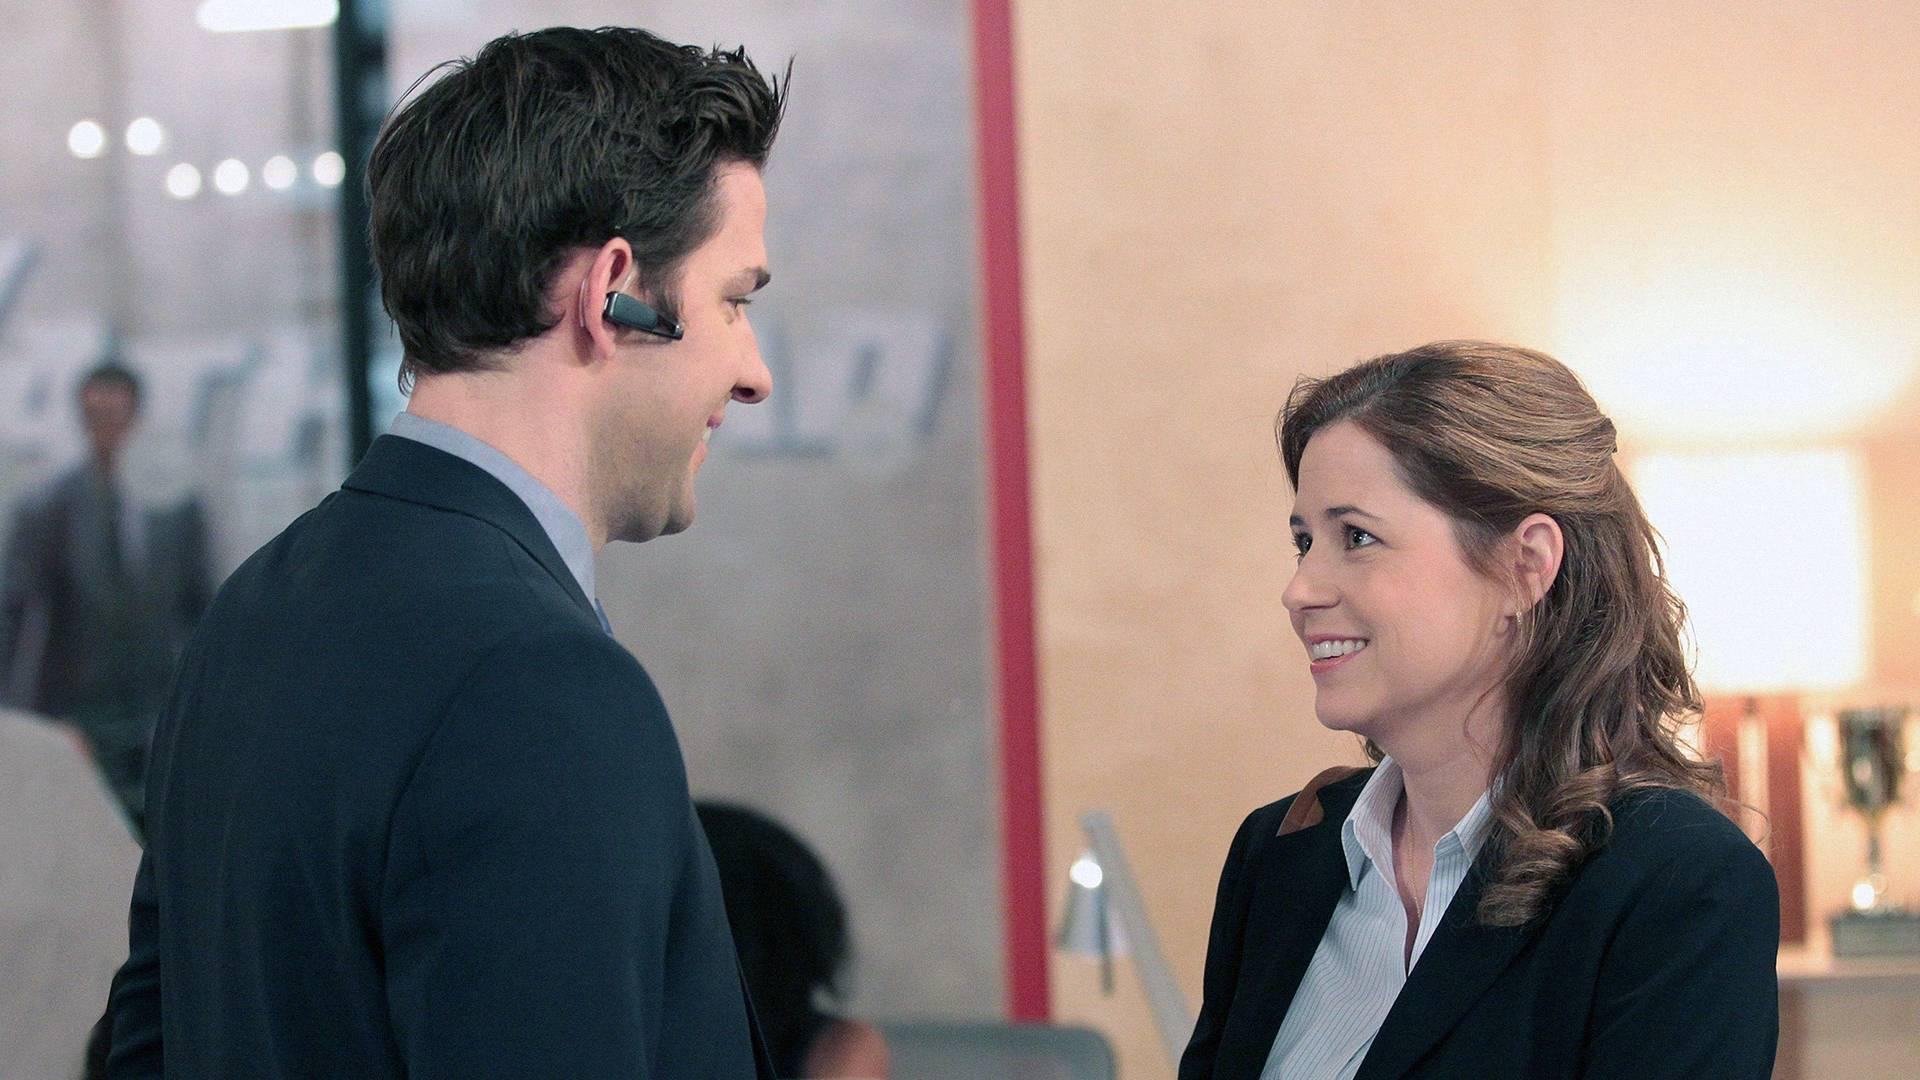 The Office Season 9 Episode 16